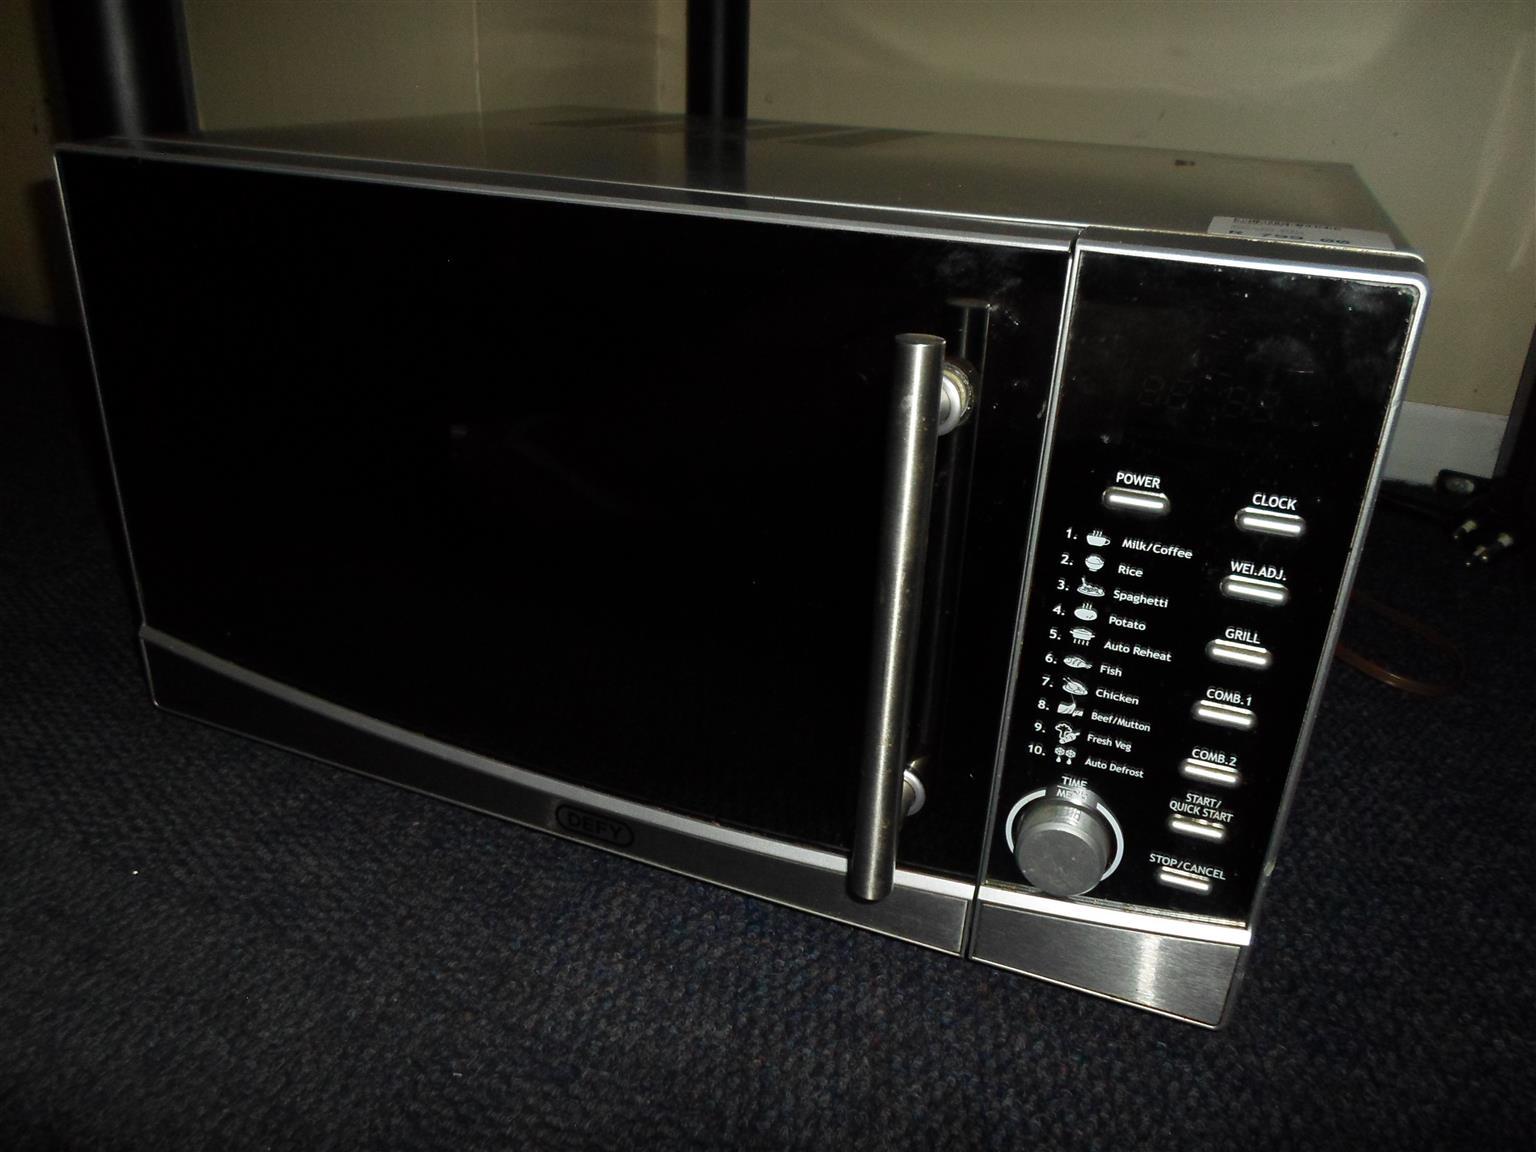 Defy Microwave